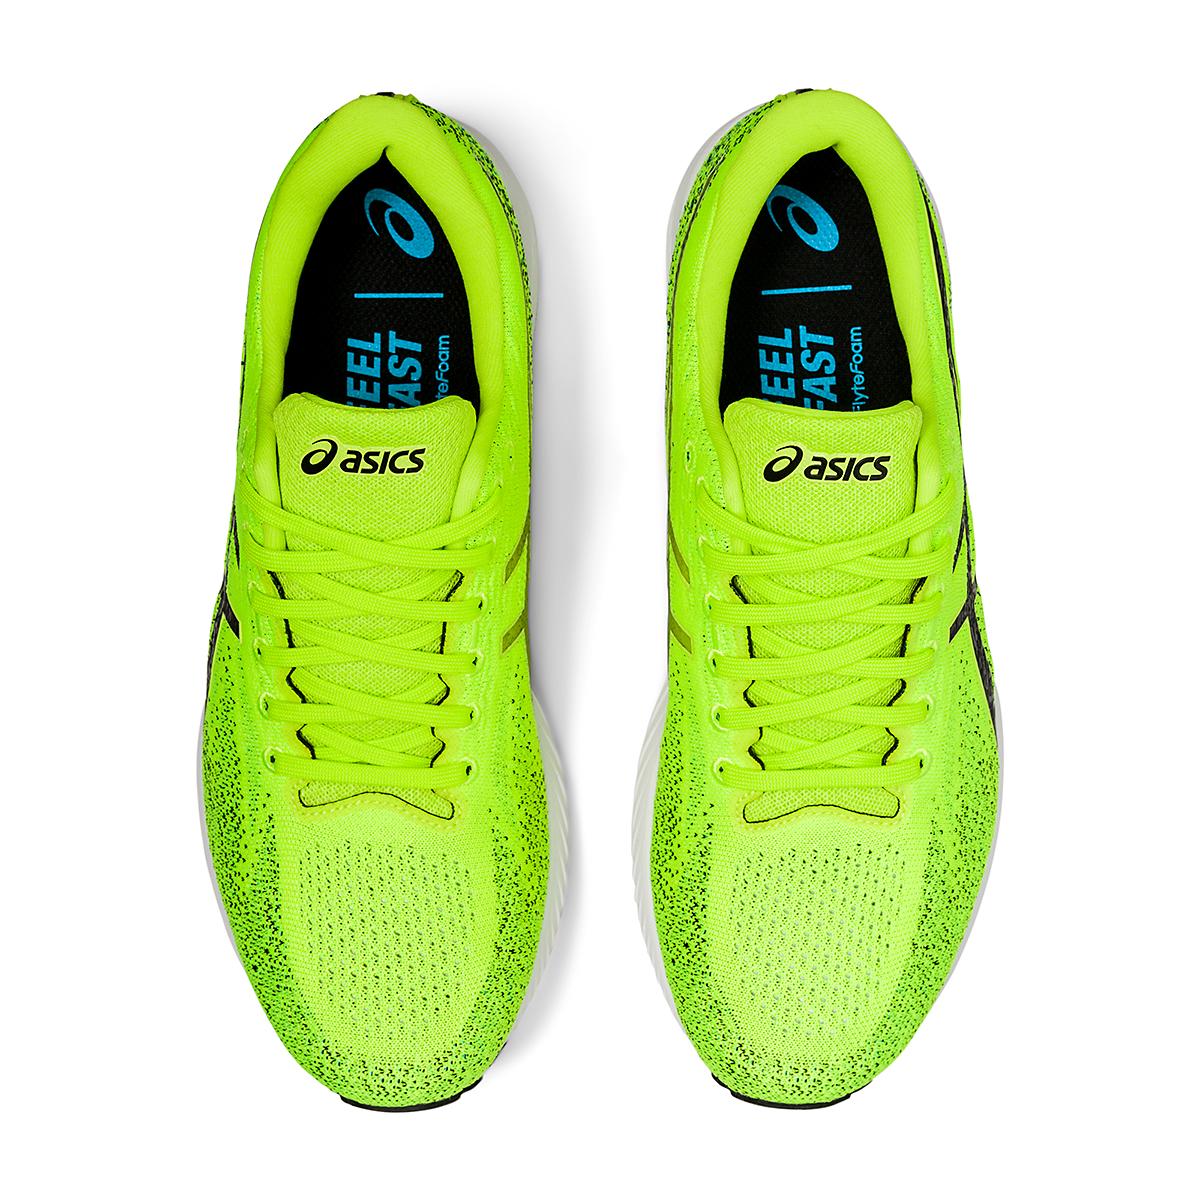 Men's Asics Gel-DS Trainer 26 Running Shoe - Color: Hazard Green/Black - Size: 6 - Width: Regular, Hazard Green/Black, large, image 6